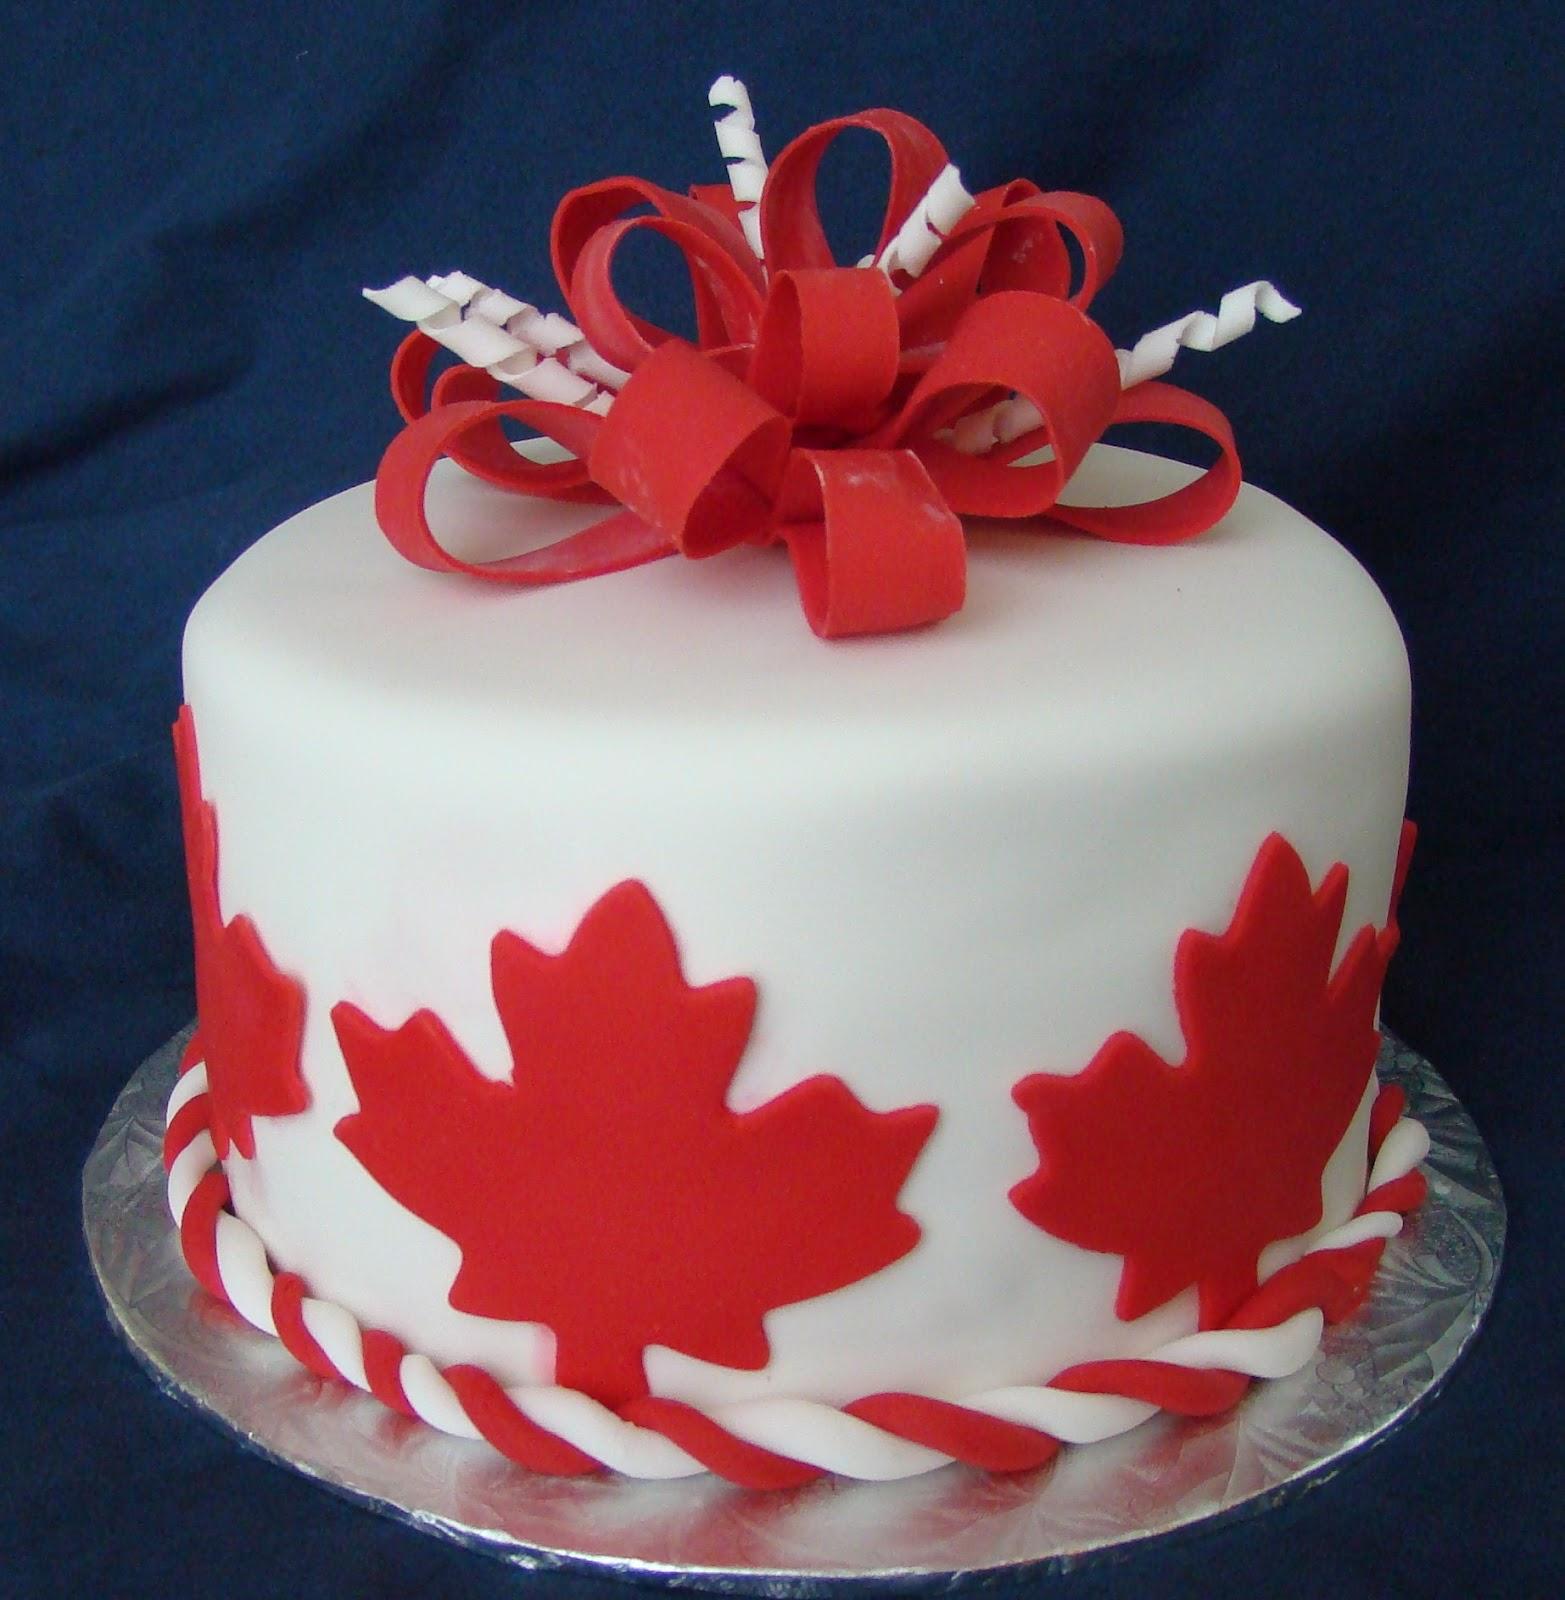 Martha's Cake Creations: Happy Birthday Canada